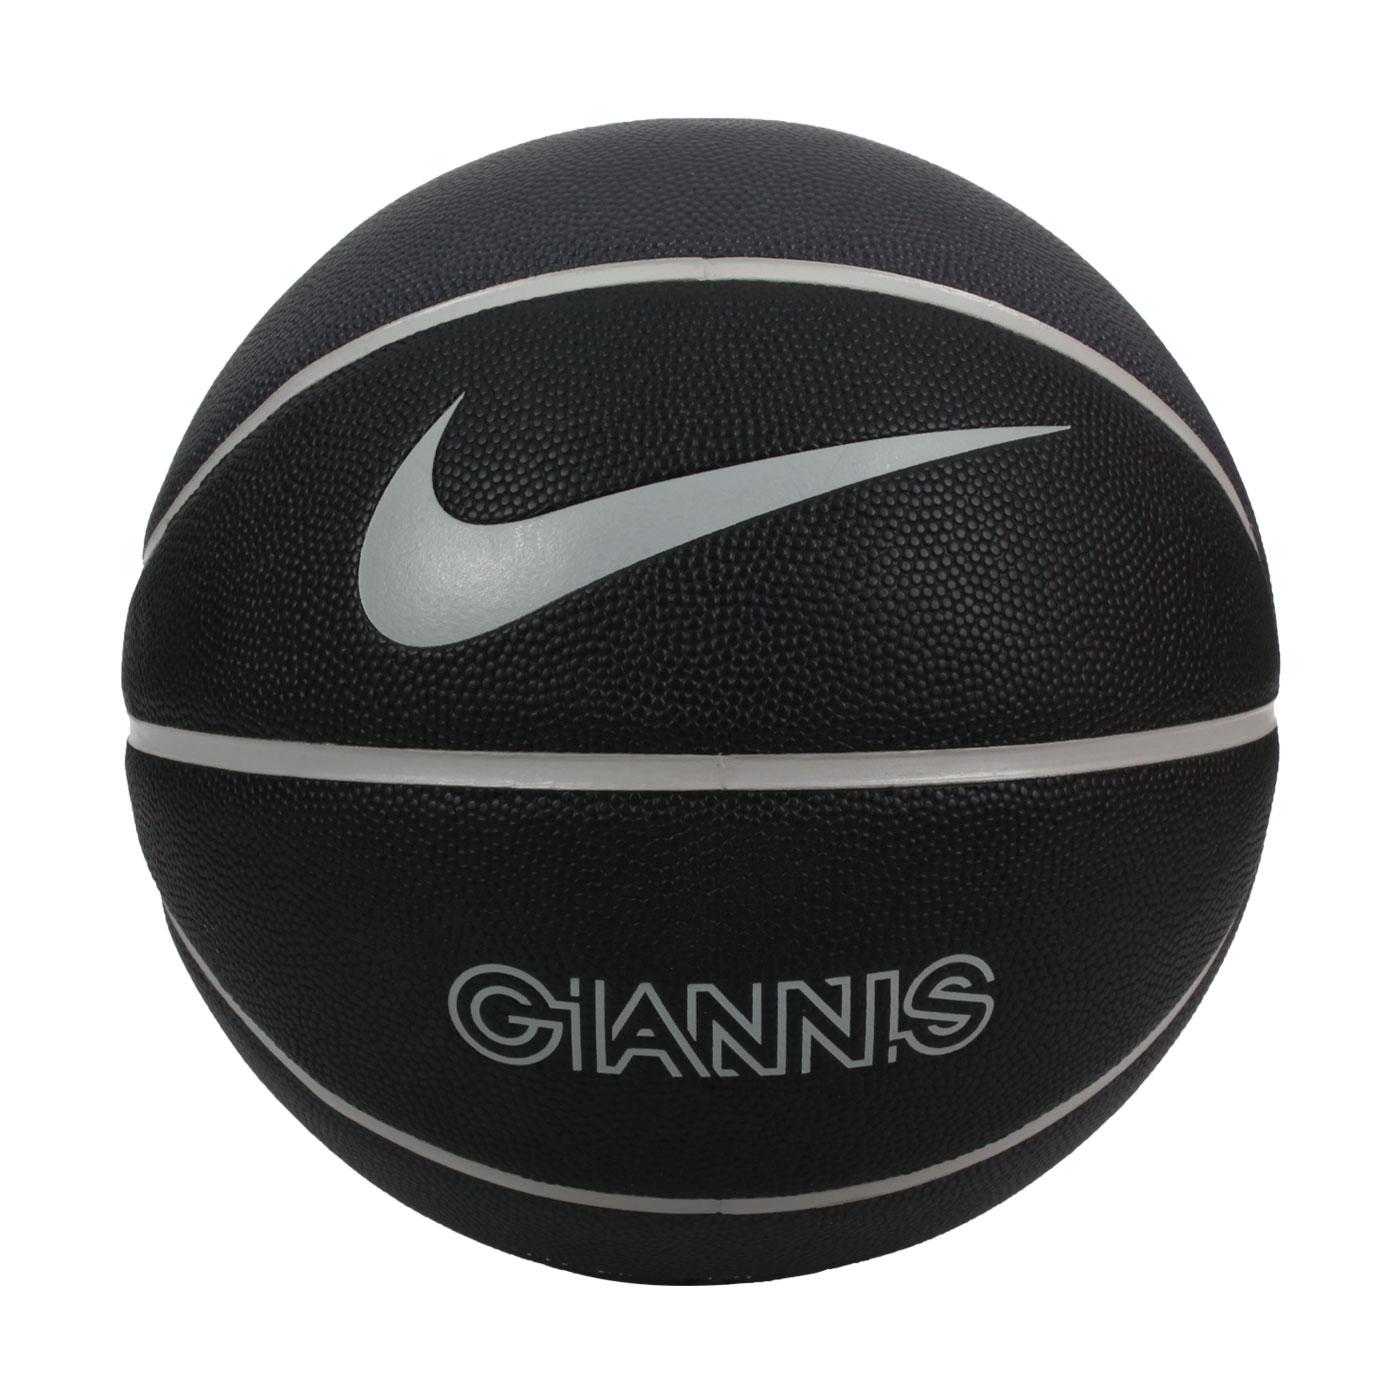 NIKE GIANNIS ALL COURT 7號籃球 N100173502107